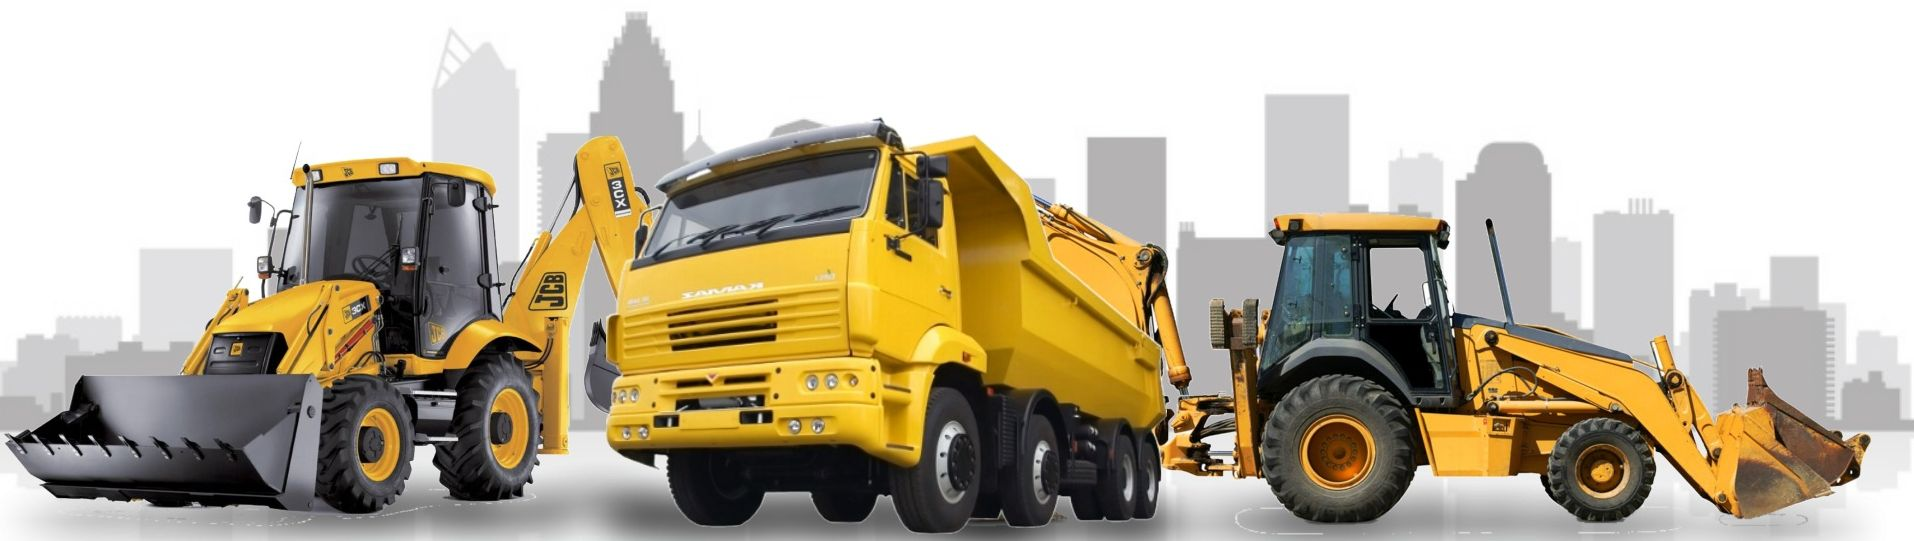 аренда грузовиков и спецтехники